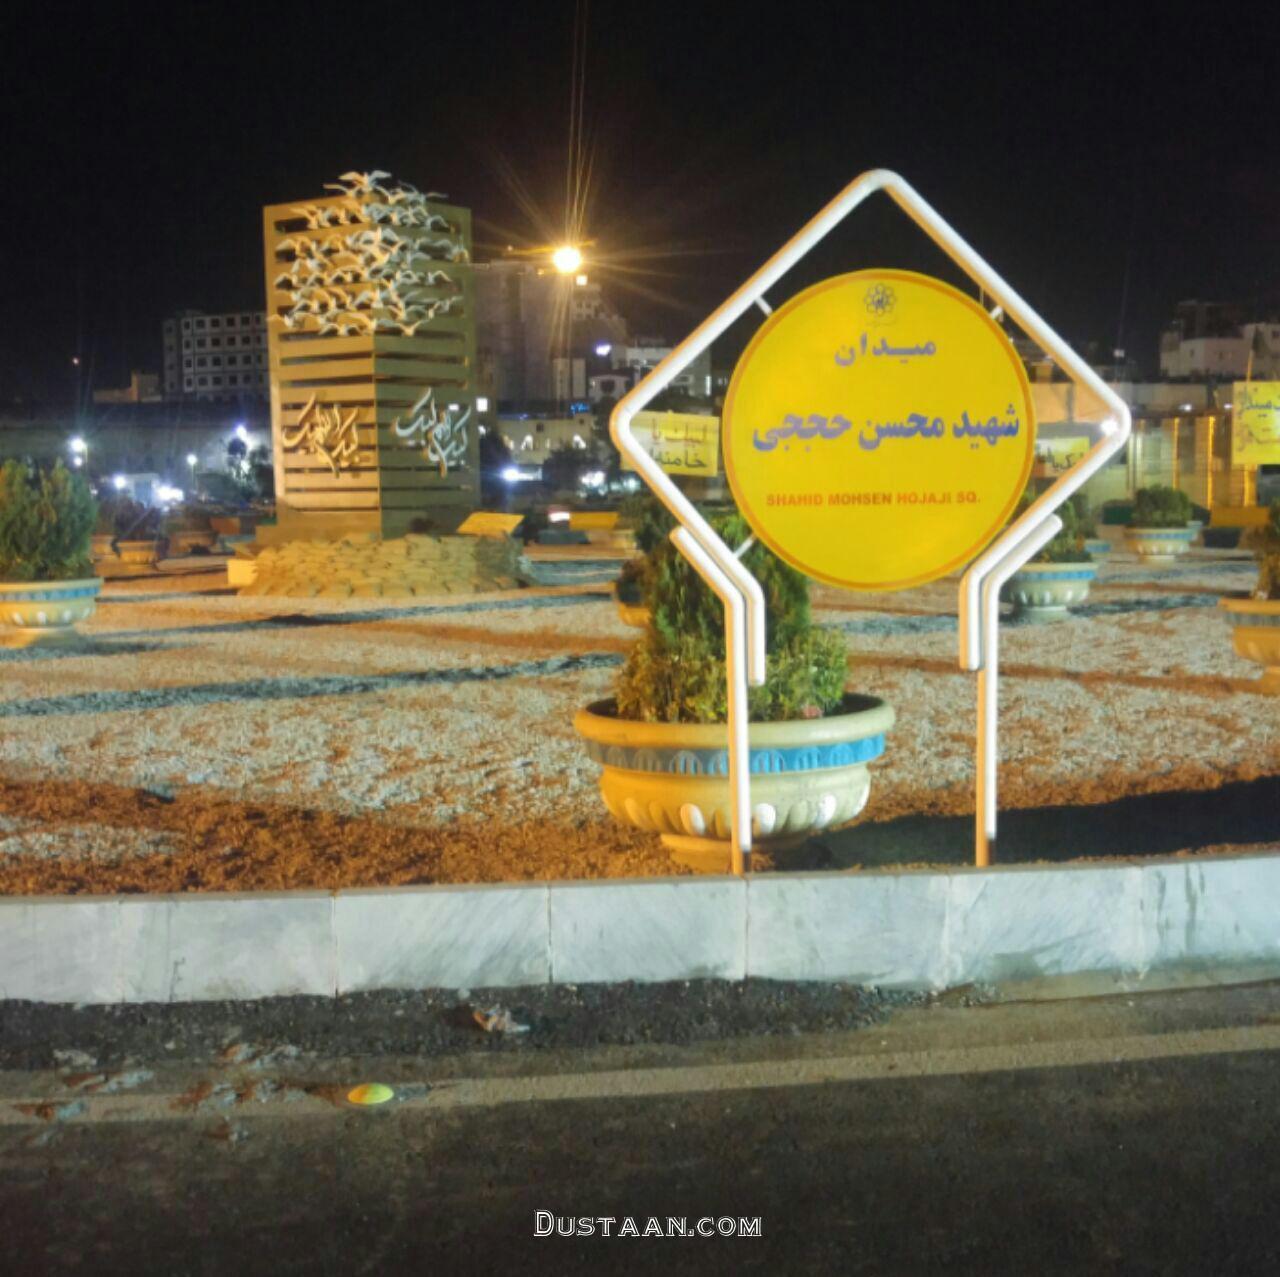 www.dustaan.com افتتاح میدان شهید محسن حججی در مشهد +عکس